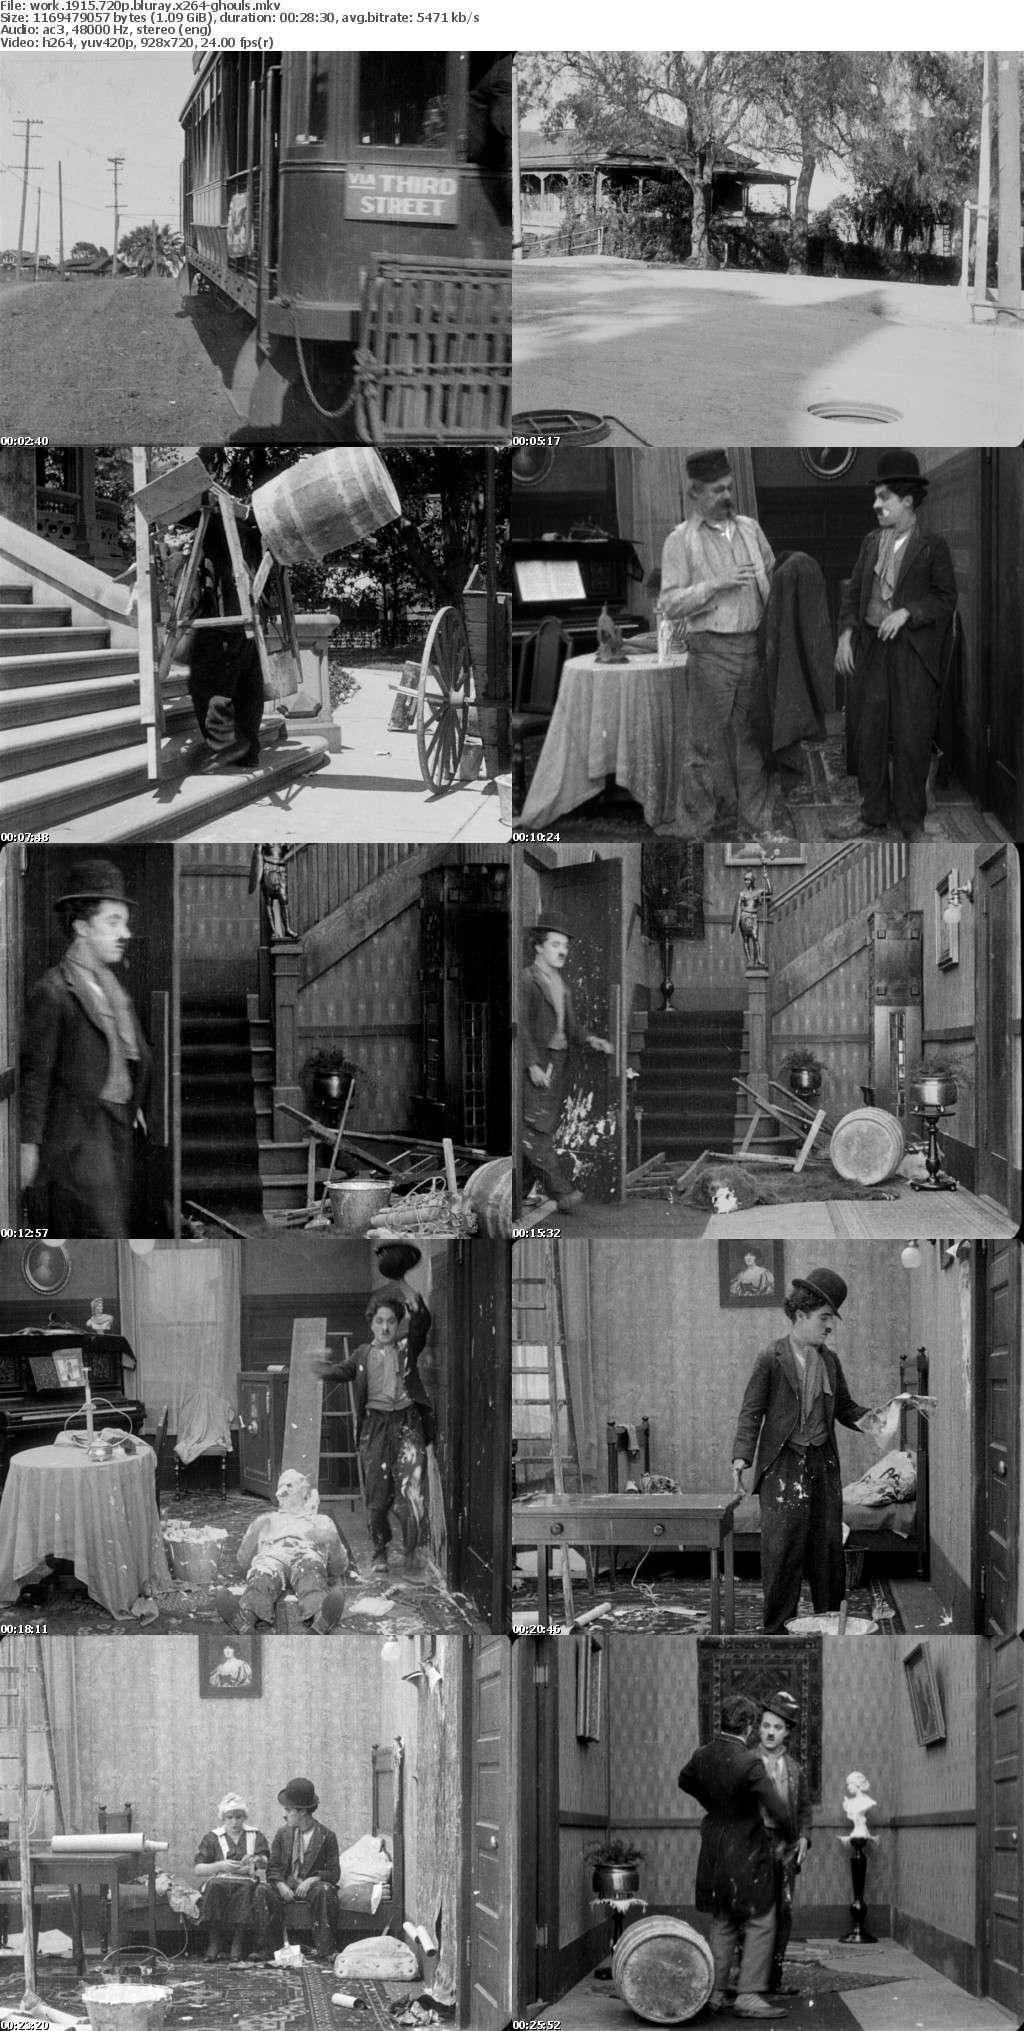 Work 1915 720p BluRay x264-GHOULS